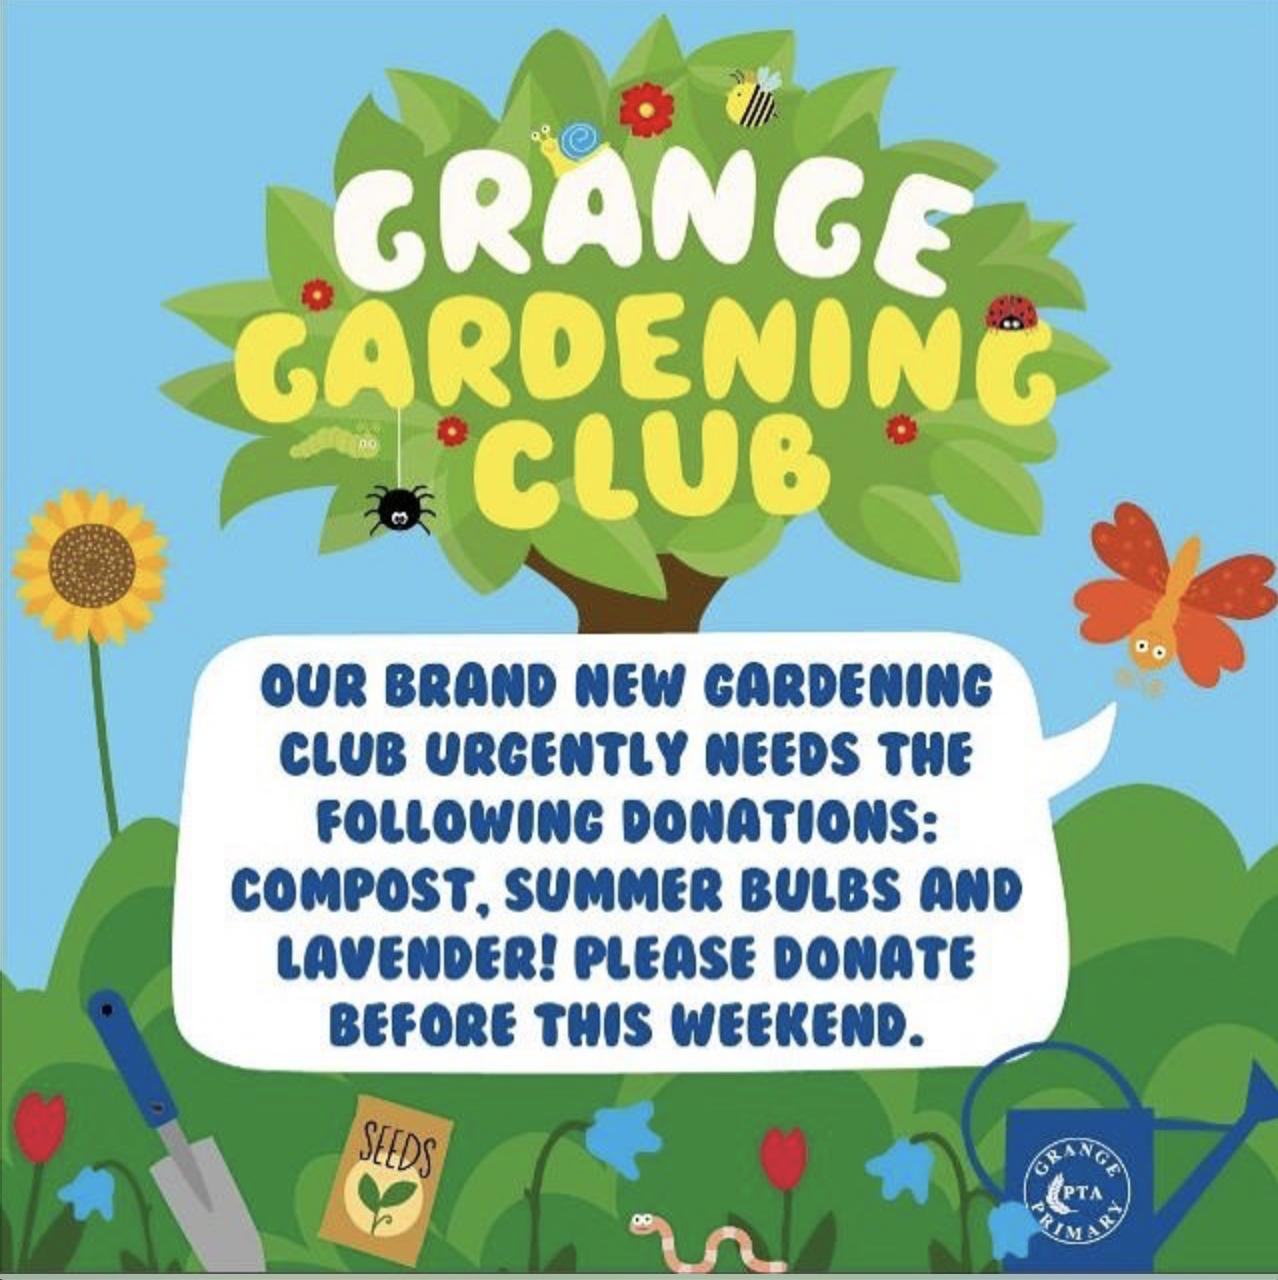 Gardening club – donations needed!